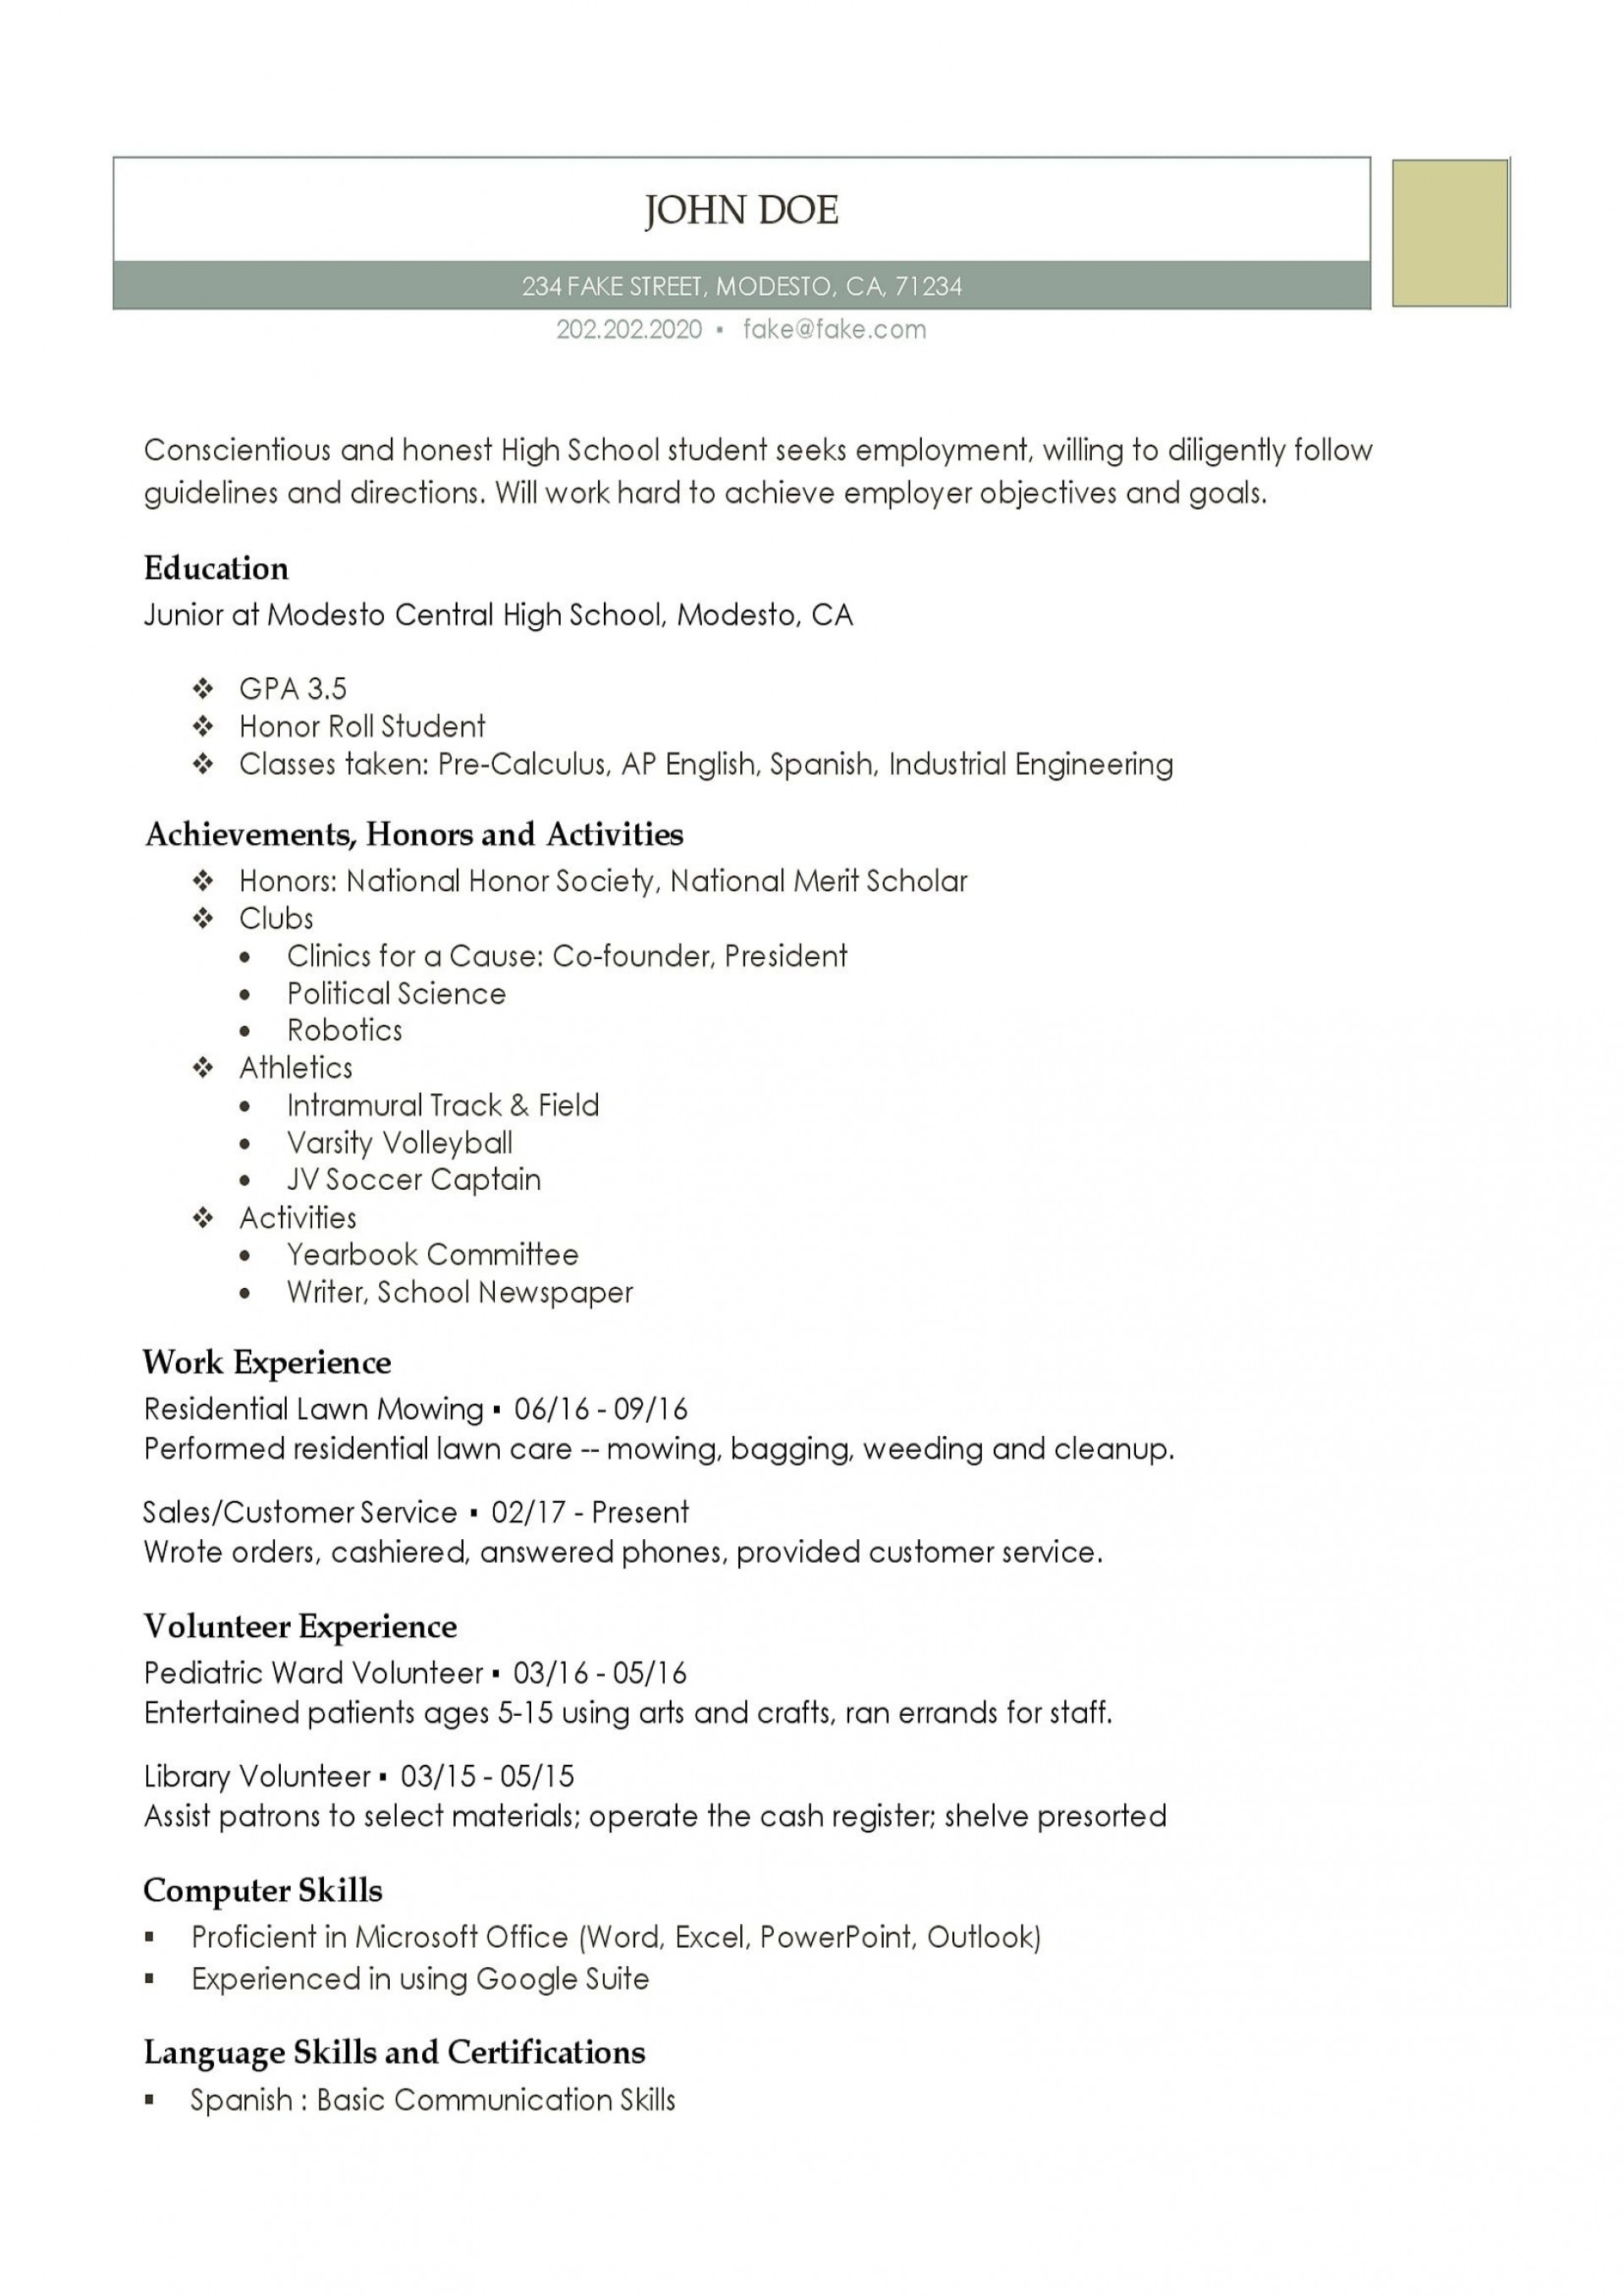 003 Stunning Resume Template For Teen Design  Teenager First Job Australia1920